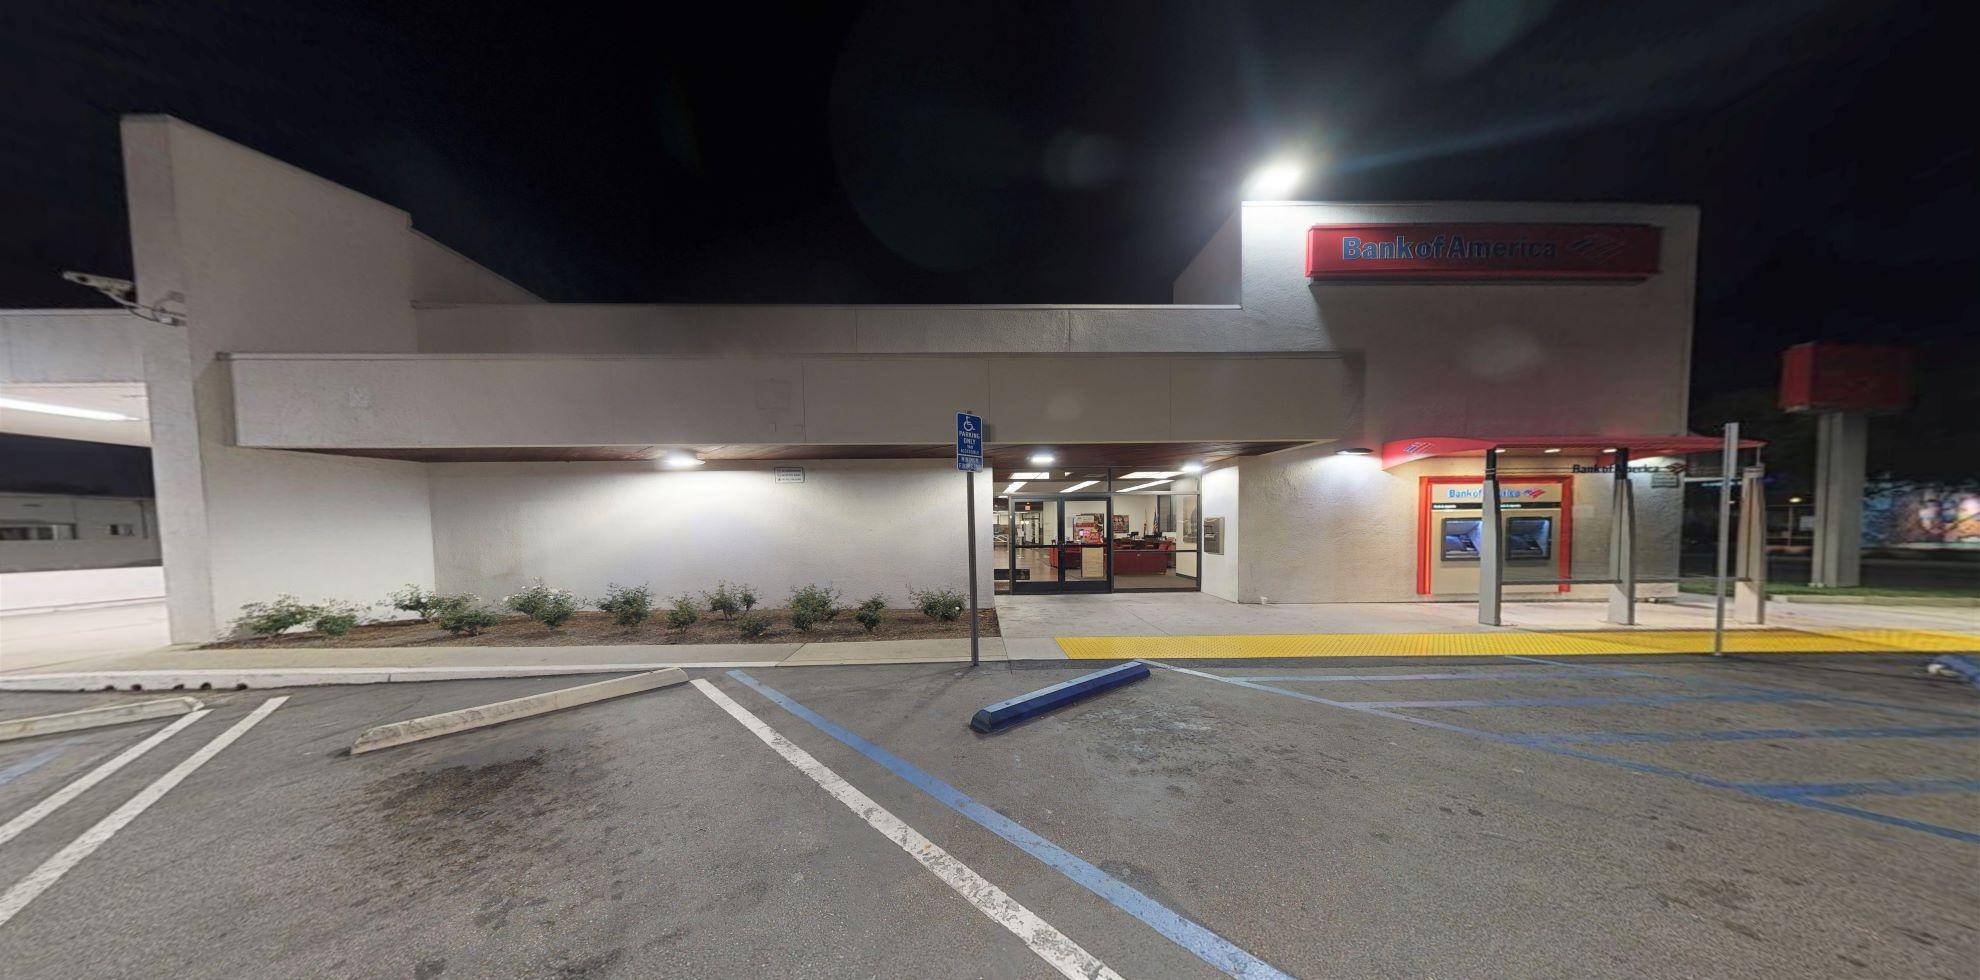 Bank of America financial center with walk-up ATM | 5253 Long Beach Blvd, Long Beach, CA 90805